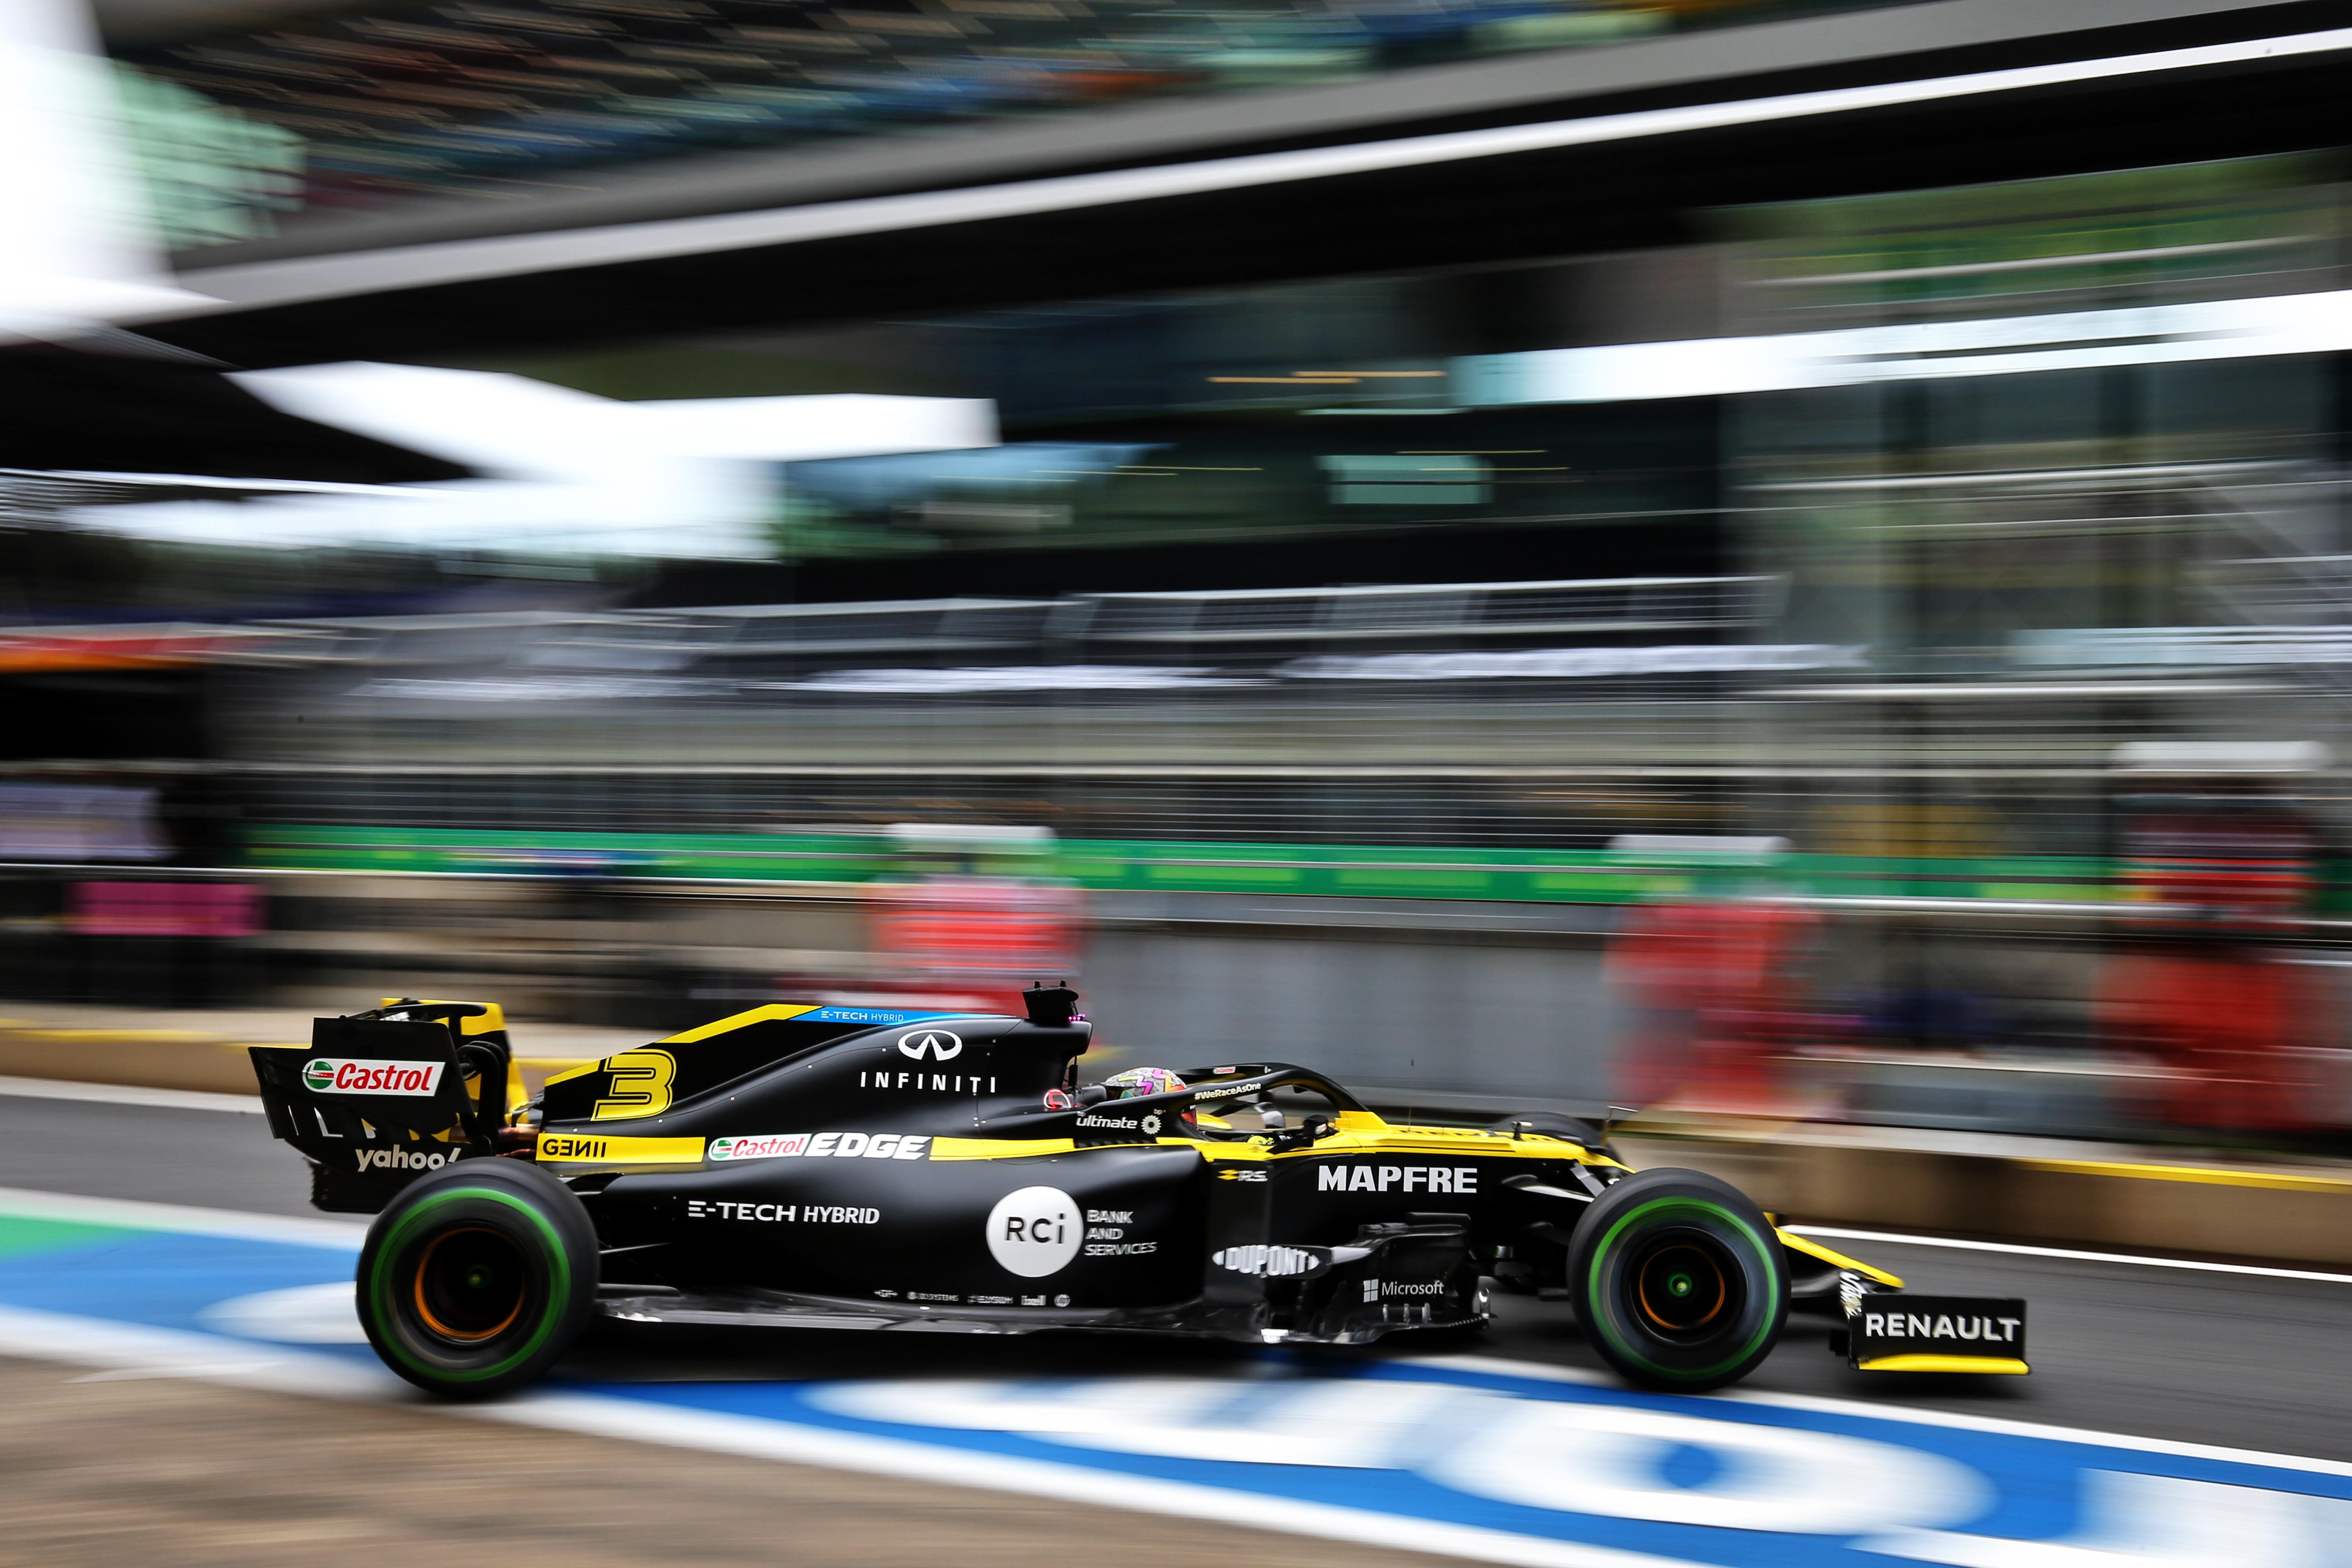 Daniel Ricciardo Renault Austrian Grand Prix 2020